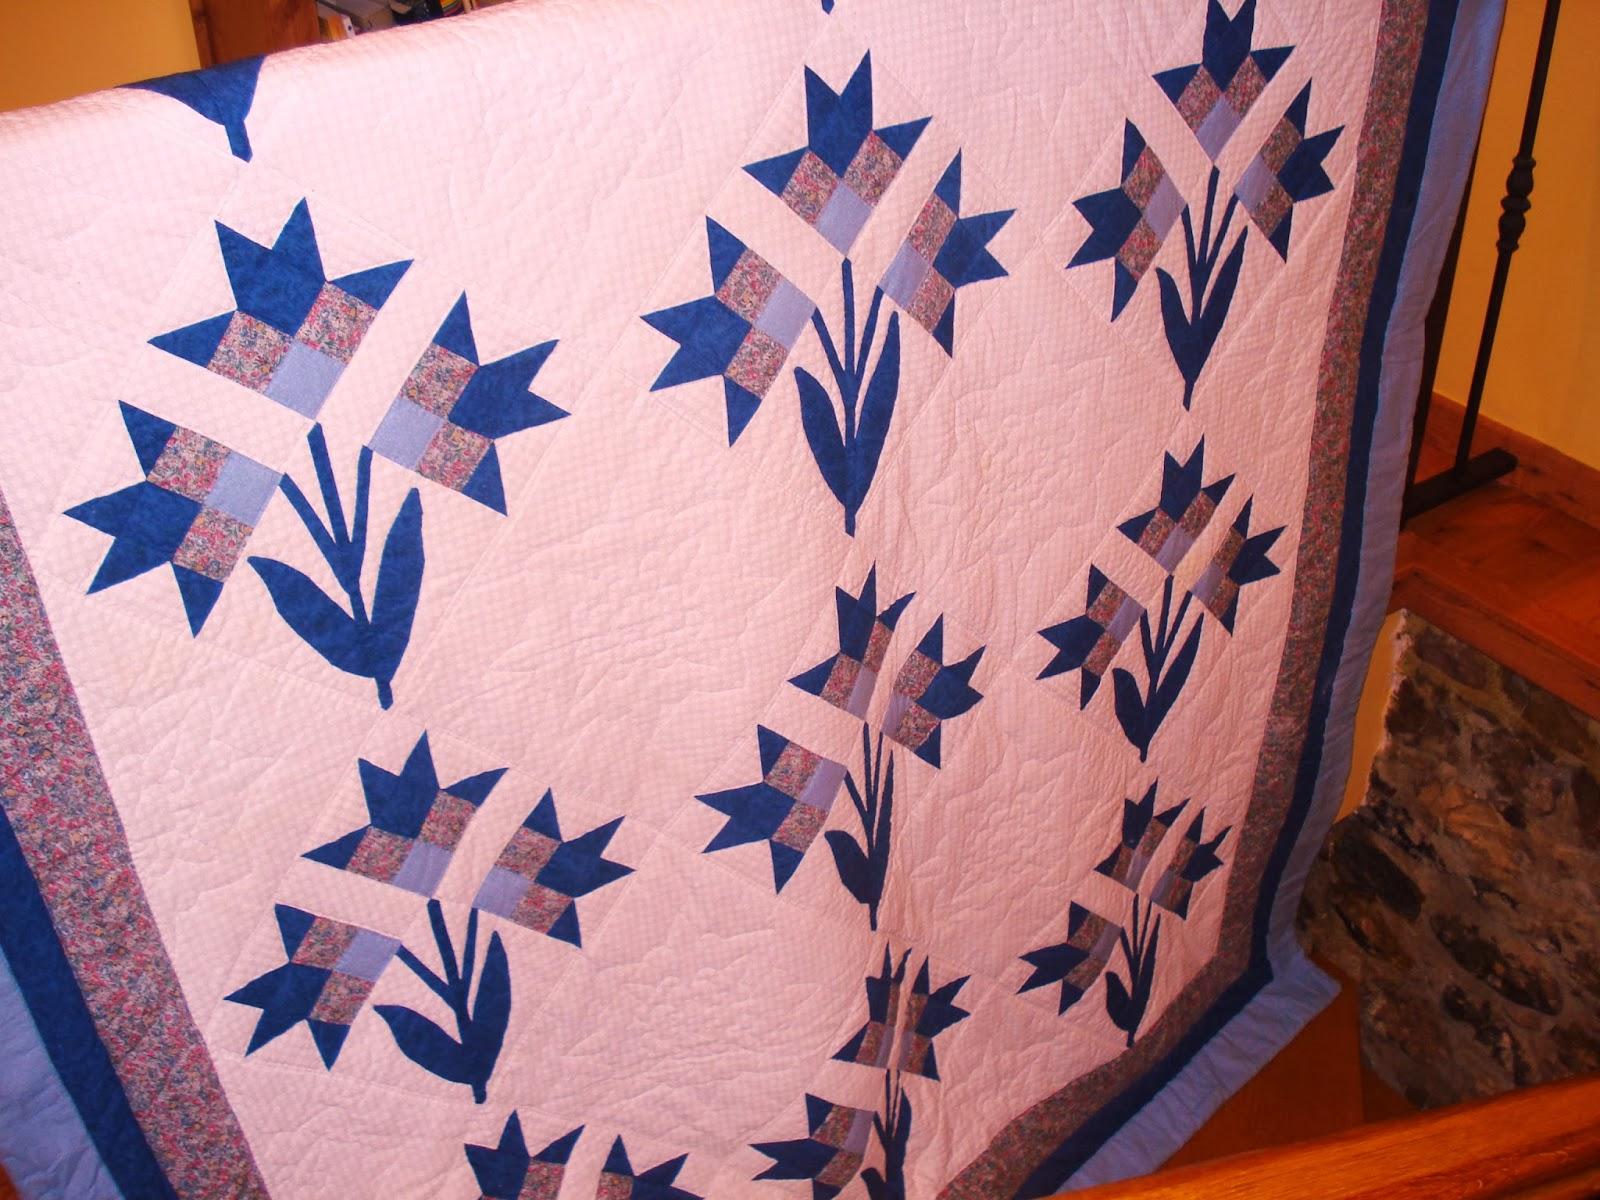 Filofieltro patchwork - Tecnicas de patchwork a mano ...